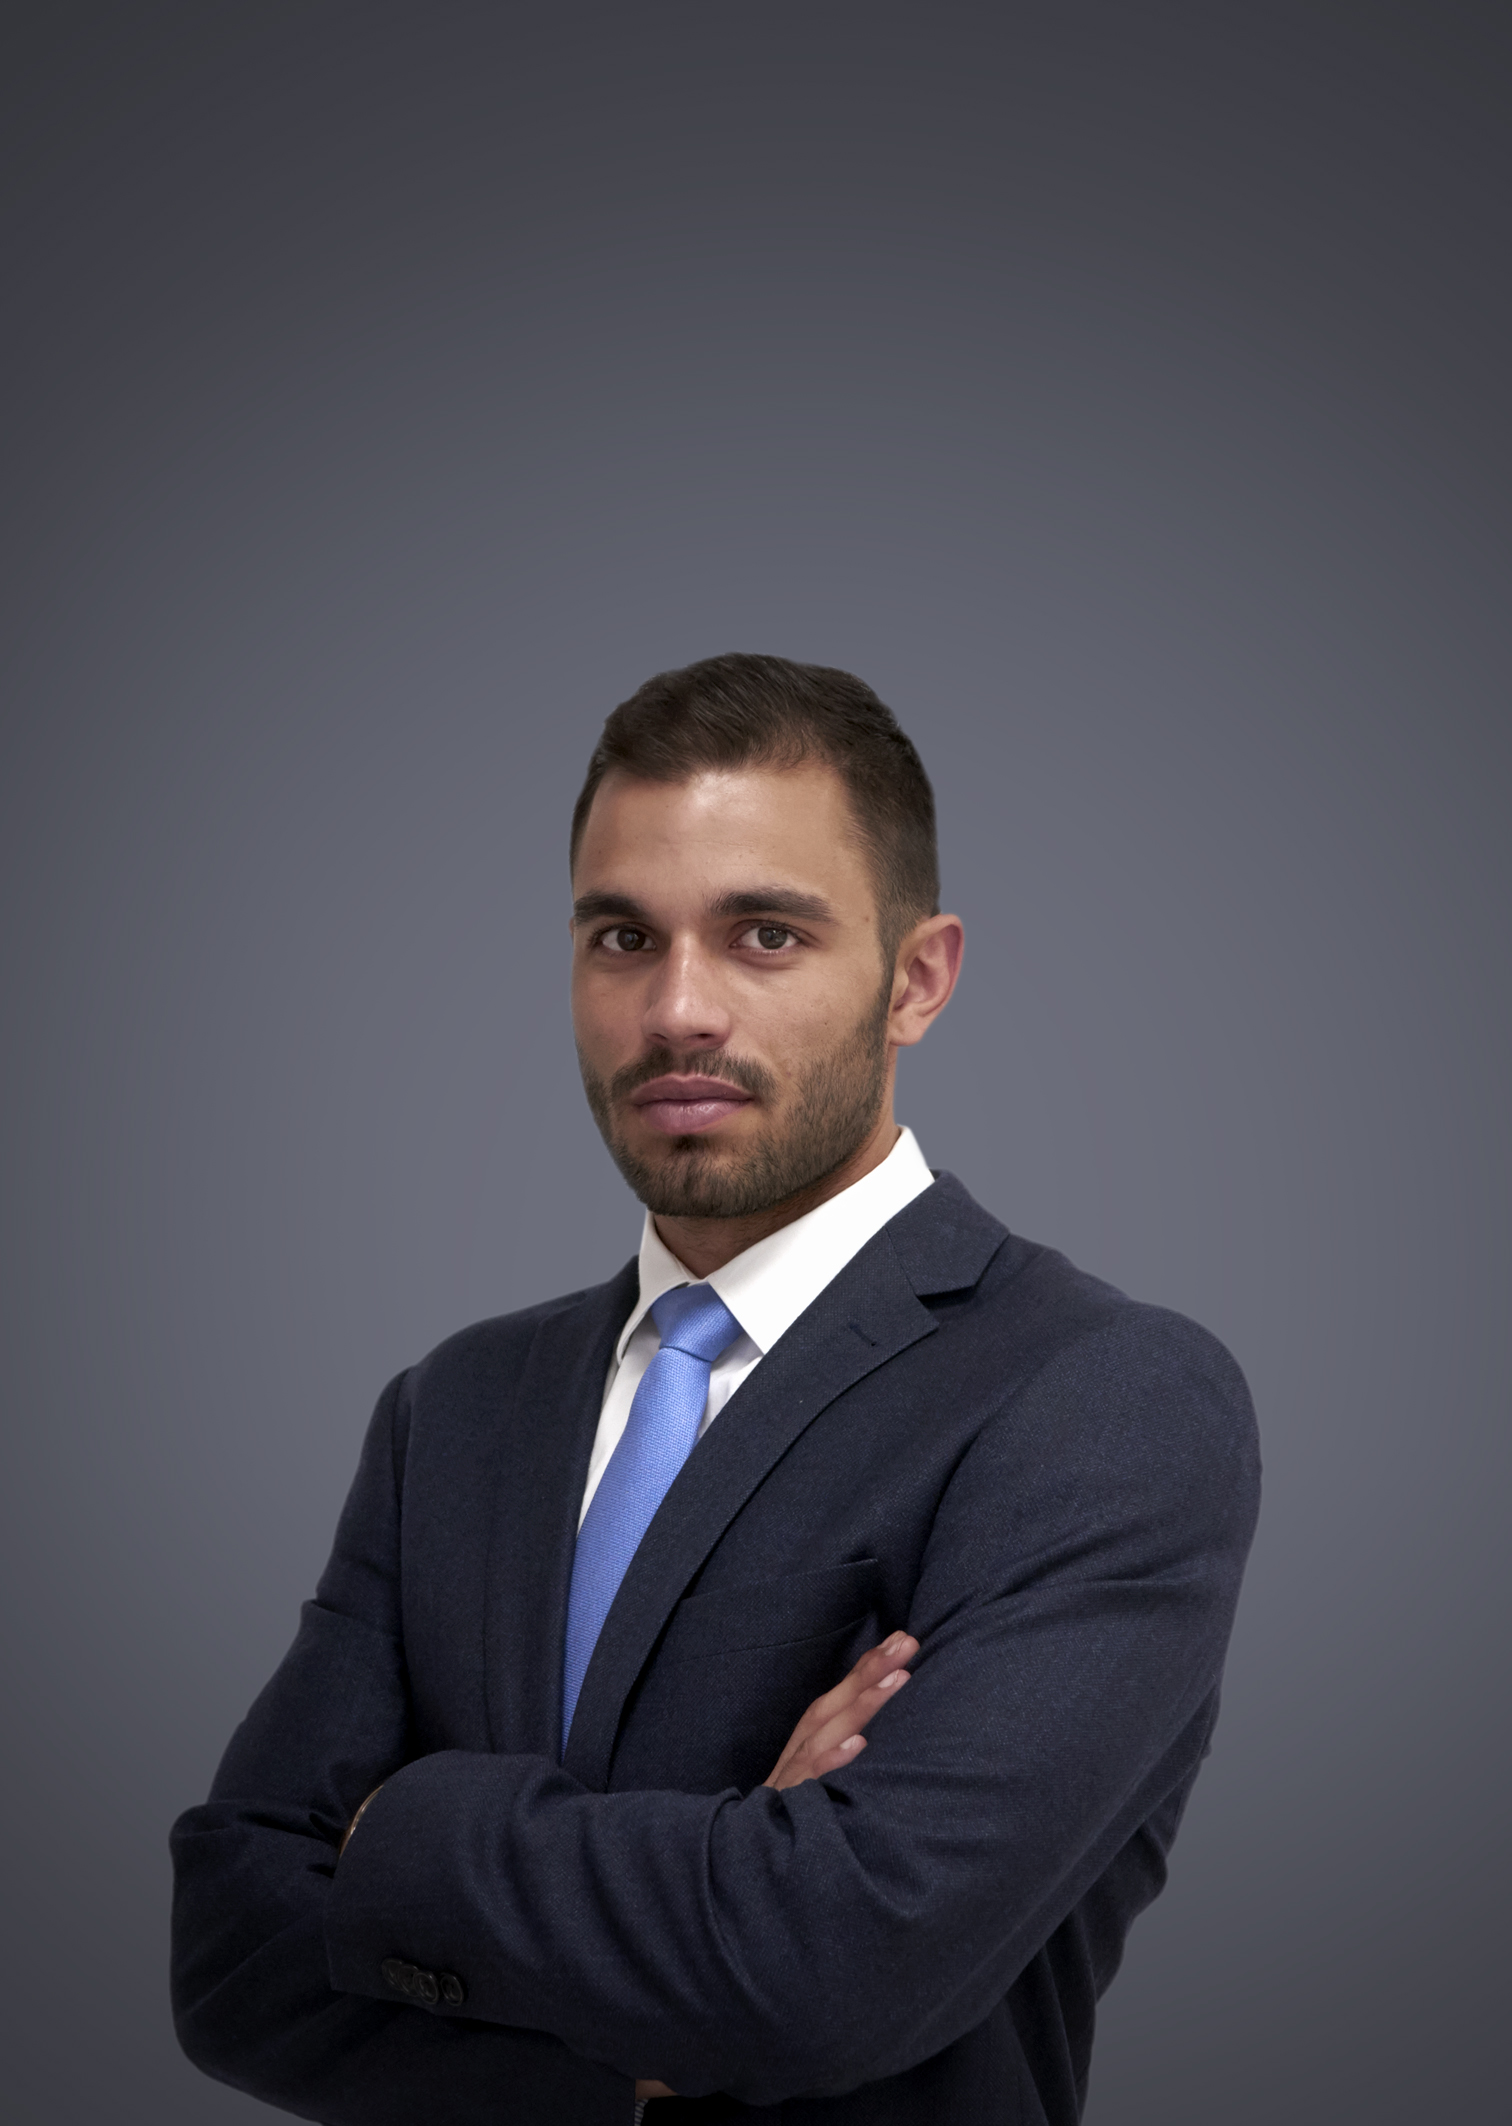 Antonio Fernández Sánchez